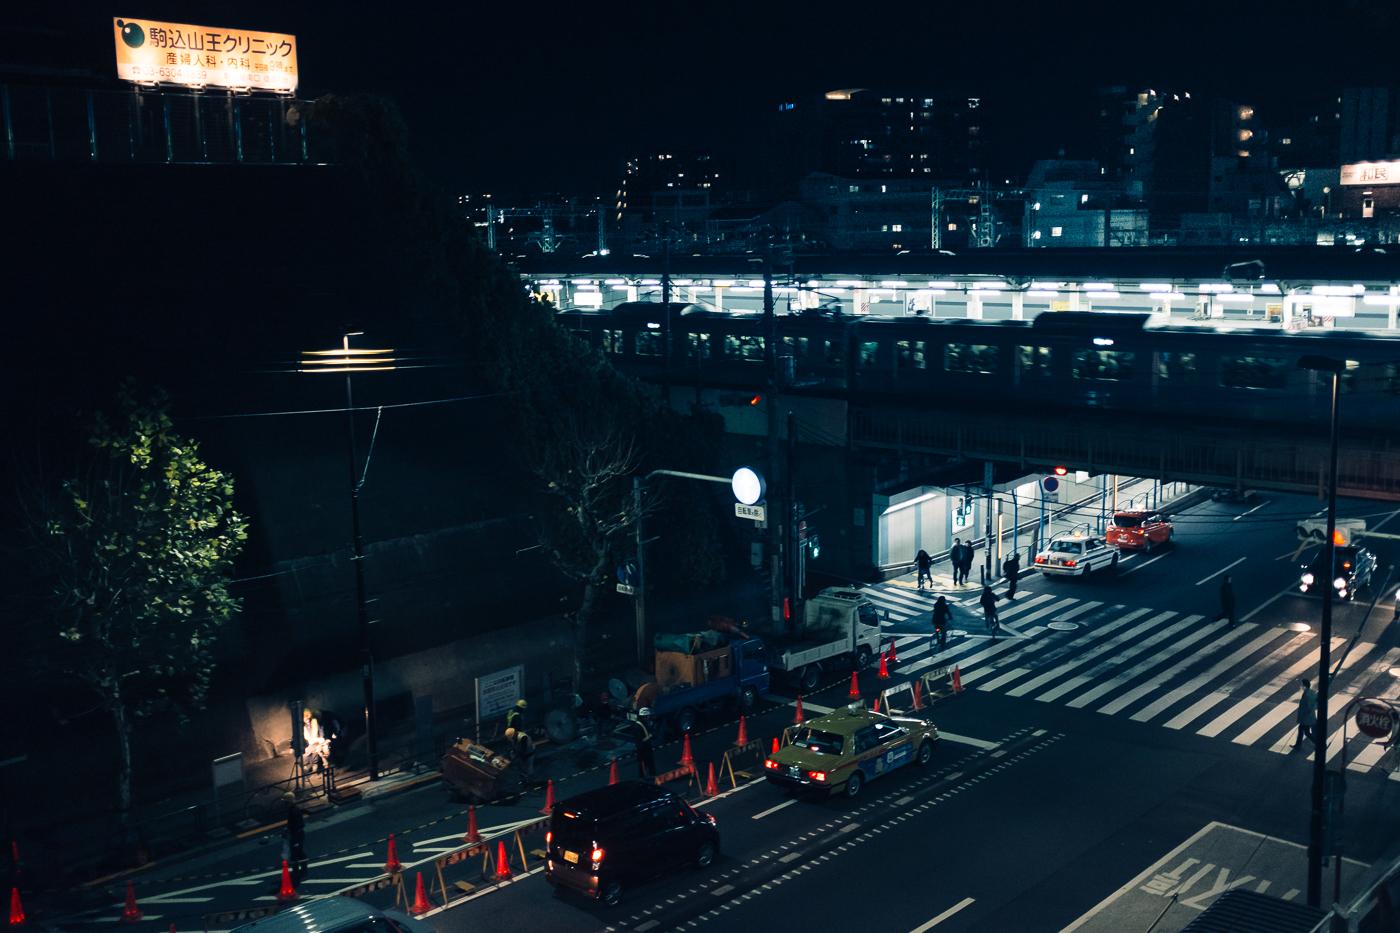 La gare de Nishi-Nippori de Nuit, à Tokyo